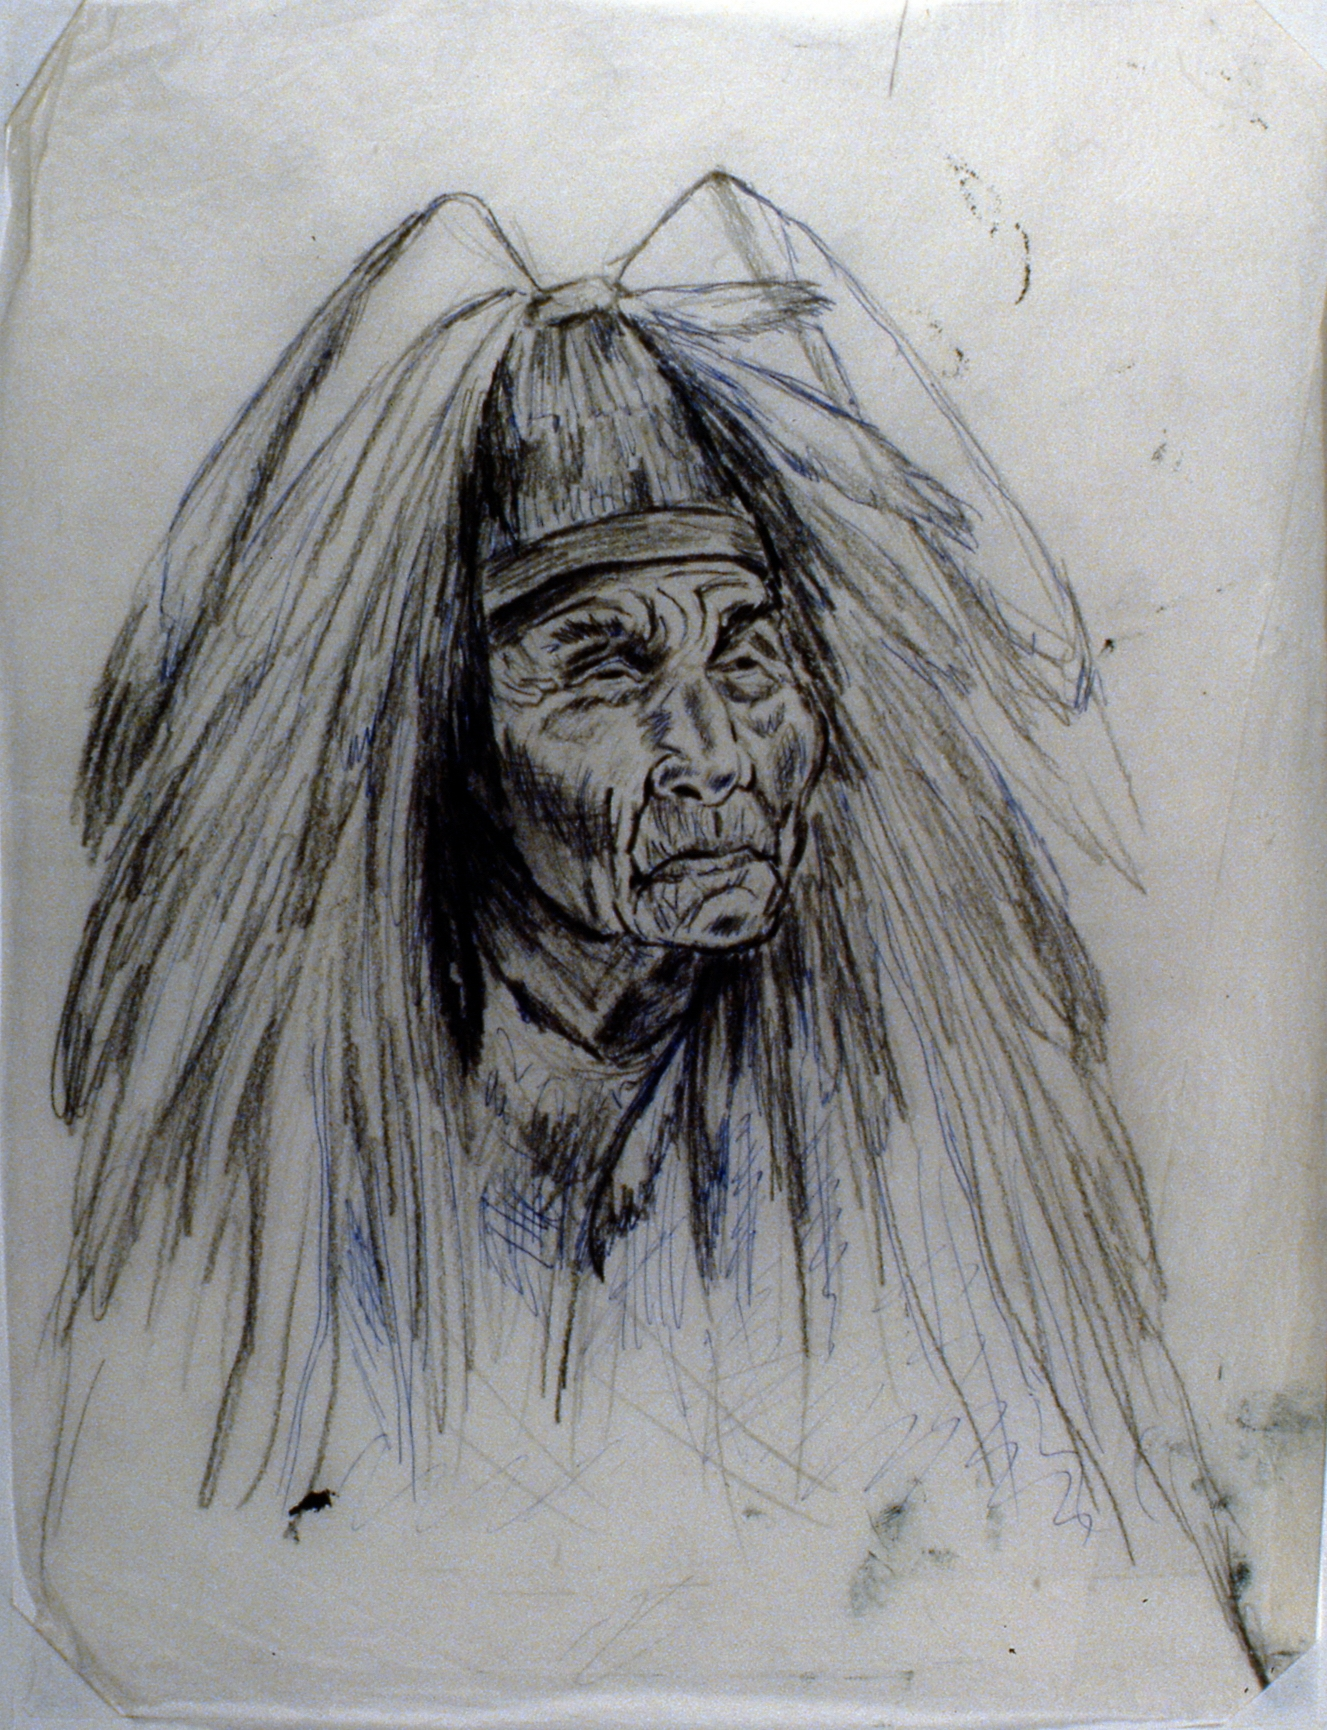 Shaman - August Jack , 1980, Minn Sjølseth, sketch, 25 x 20 cm, 1996.02.07